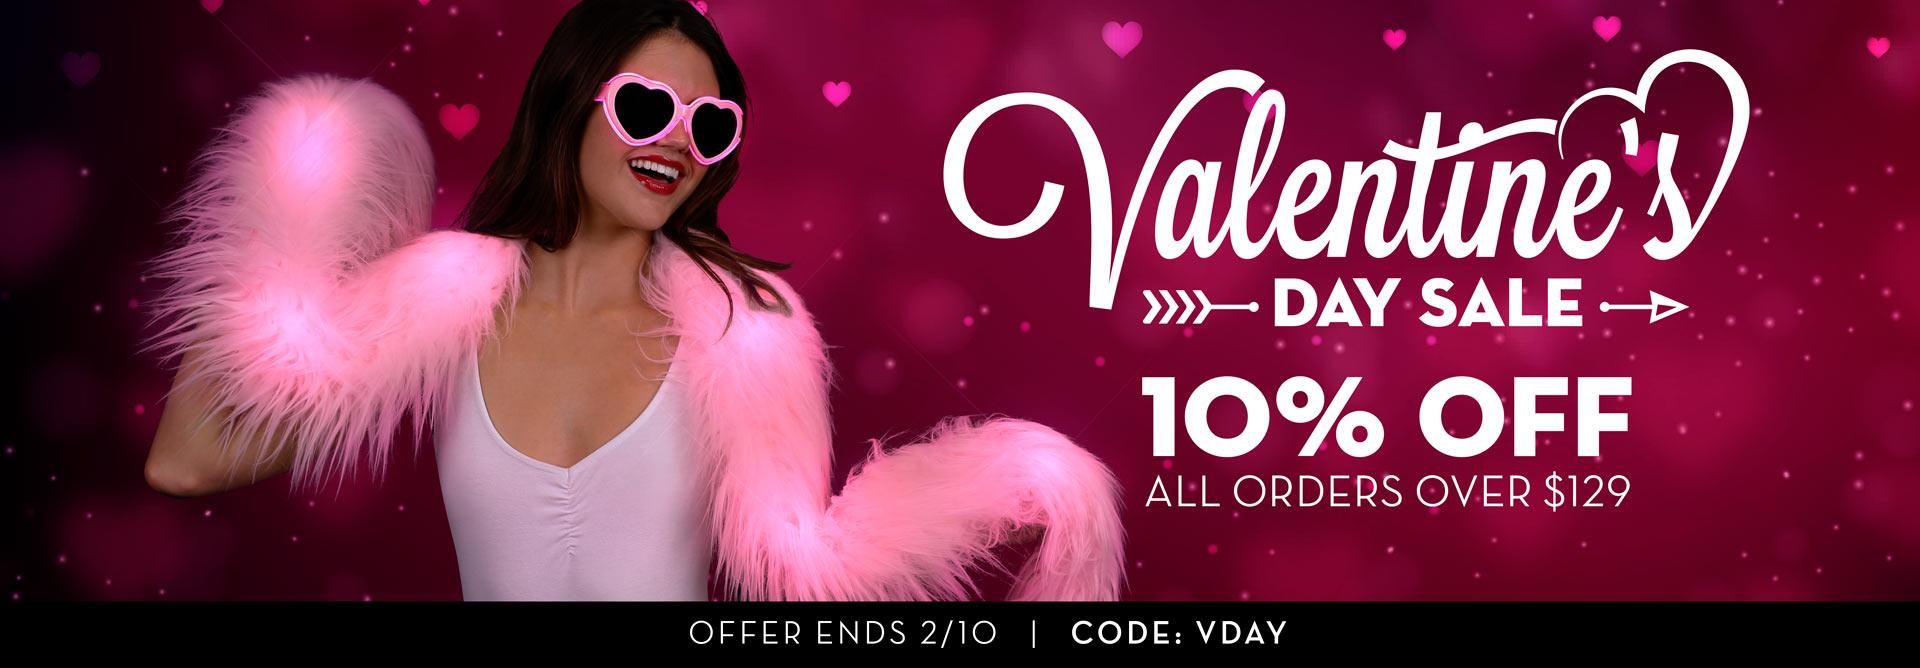 Valentine's Day Promo Offer